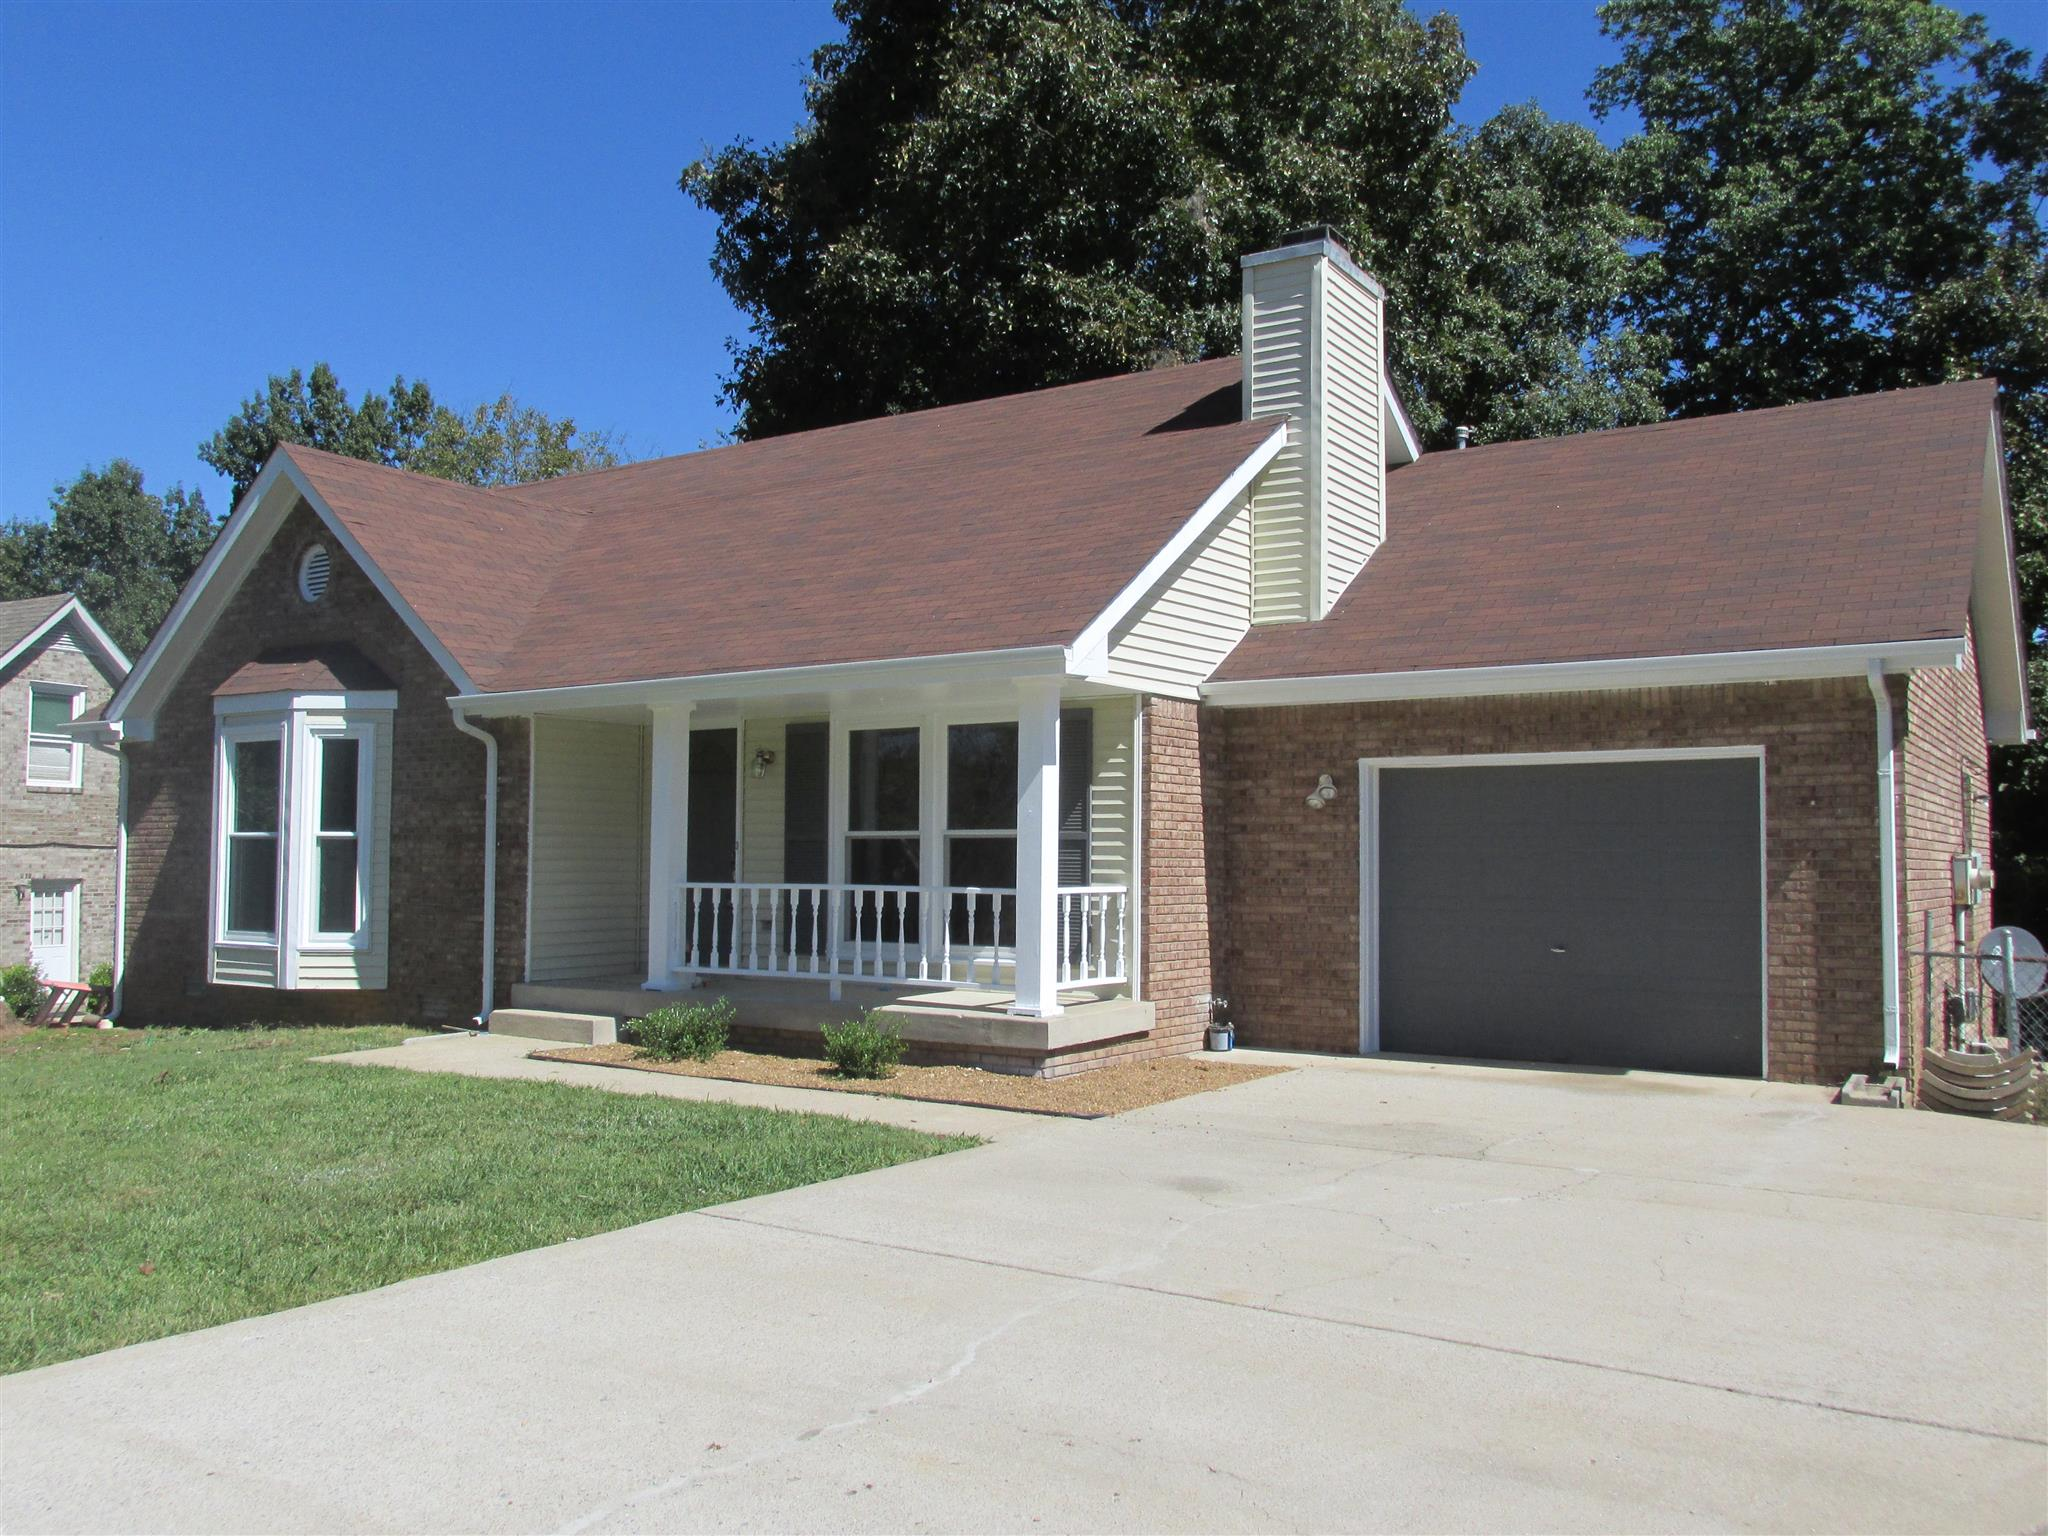 1153 Woodbridge Dr, Clarksville, TN 37042